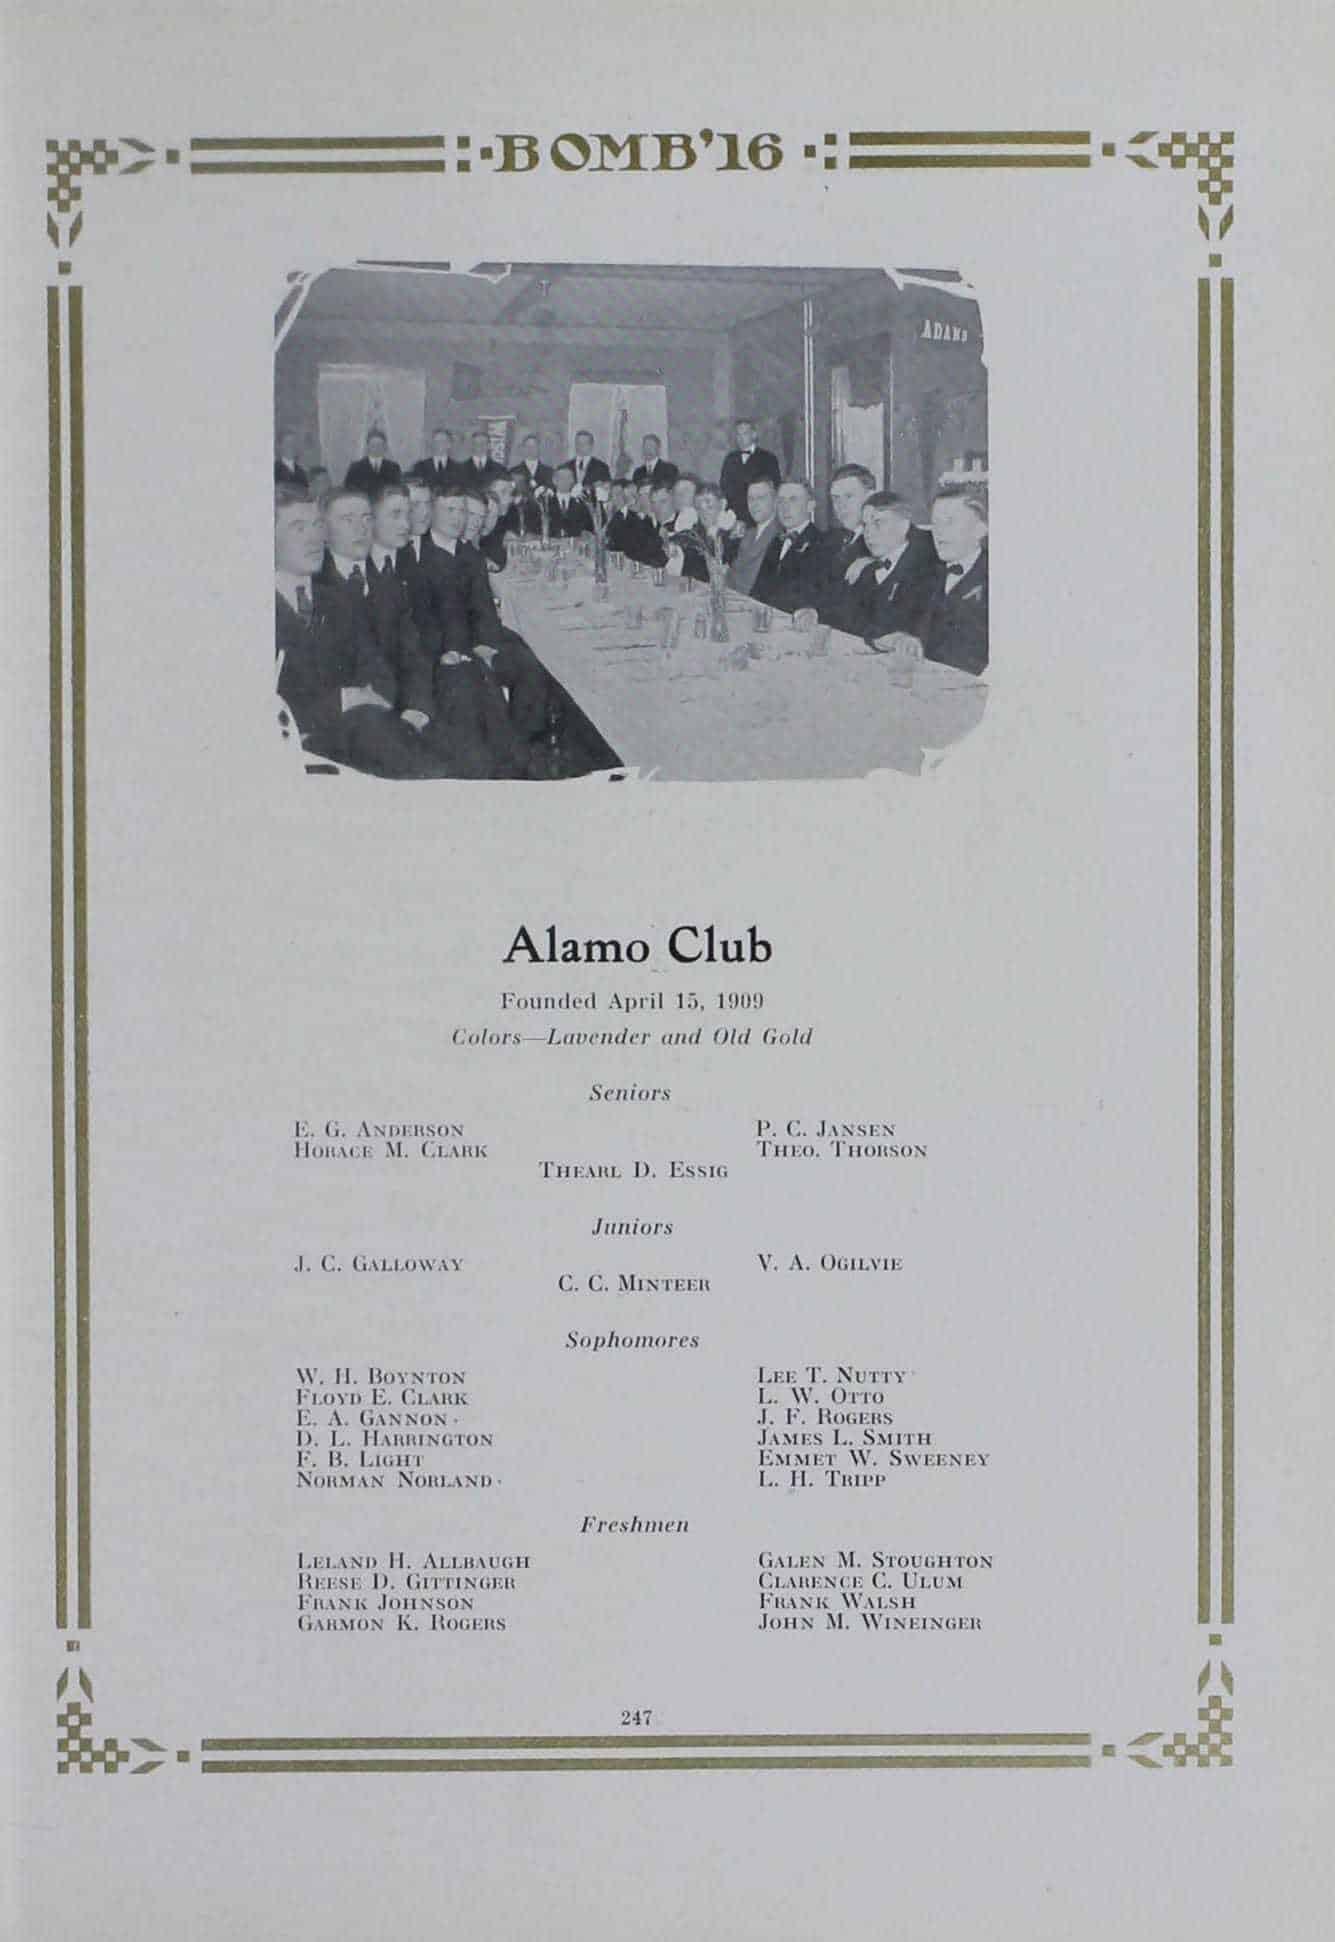 1915 Alamo Club Roster